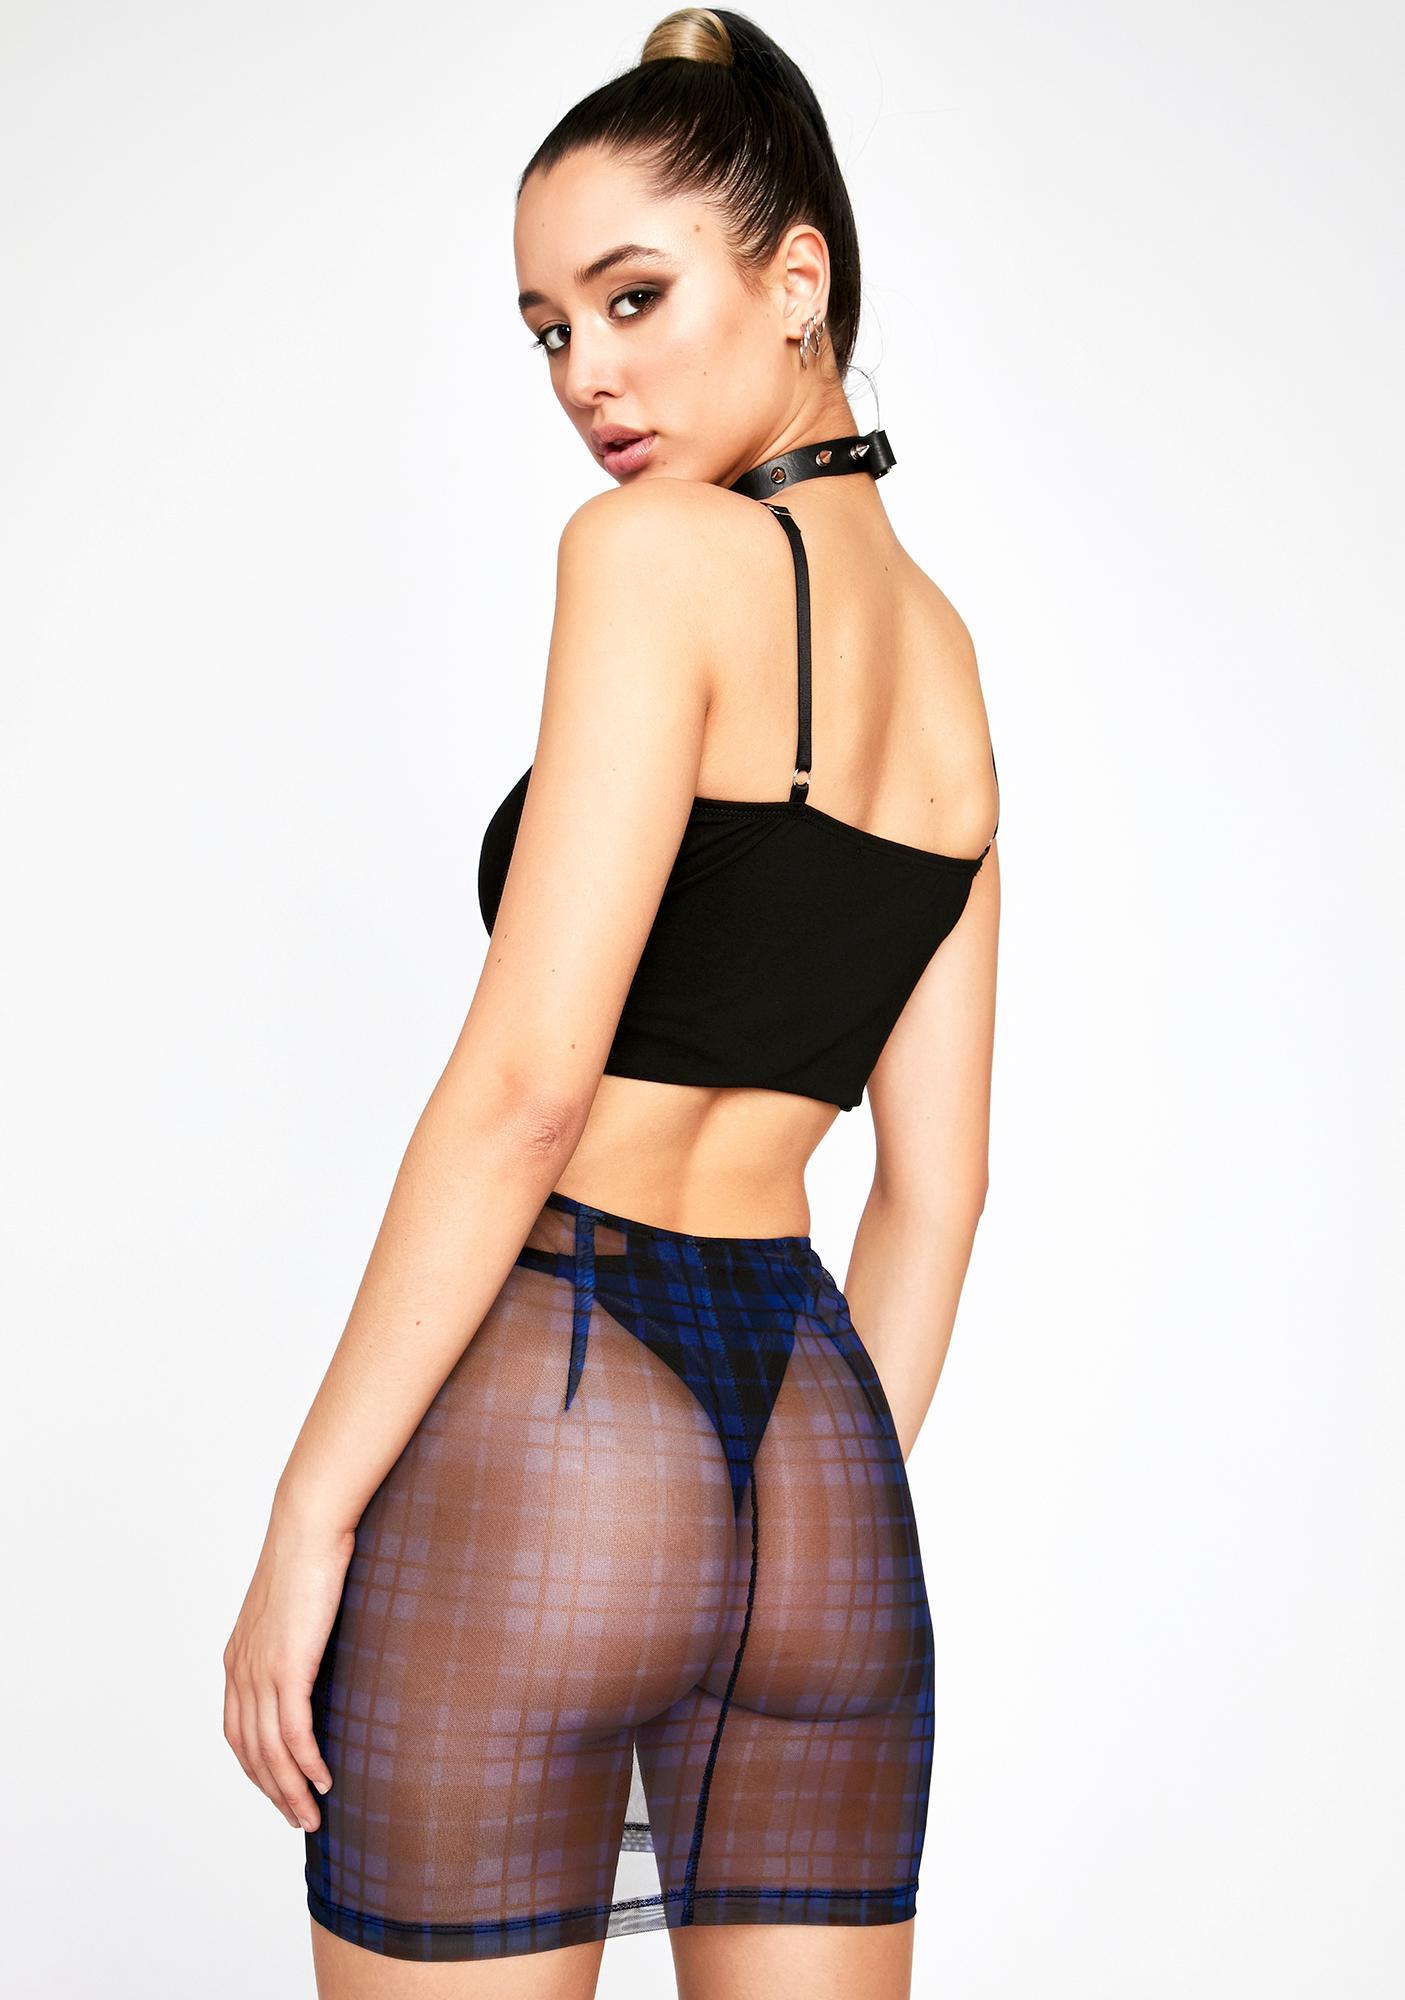 Tunnel Vision Mini Skirt